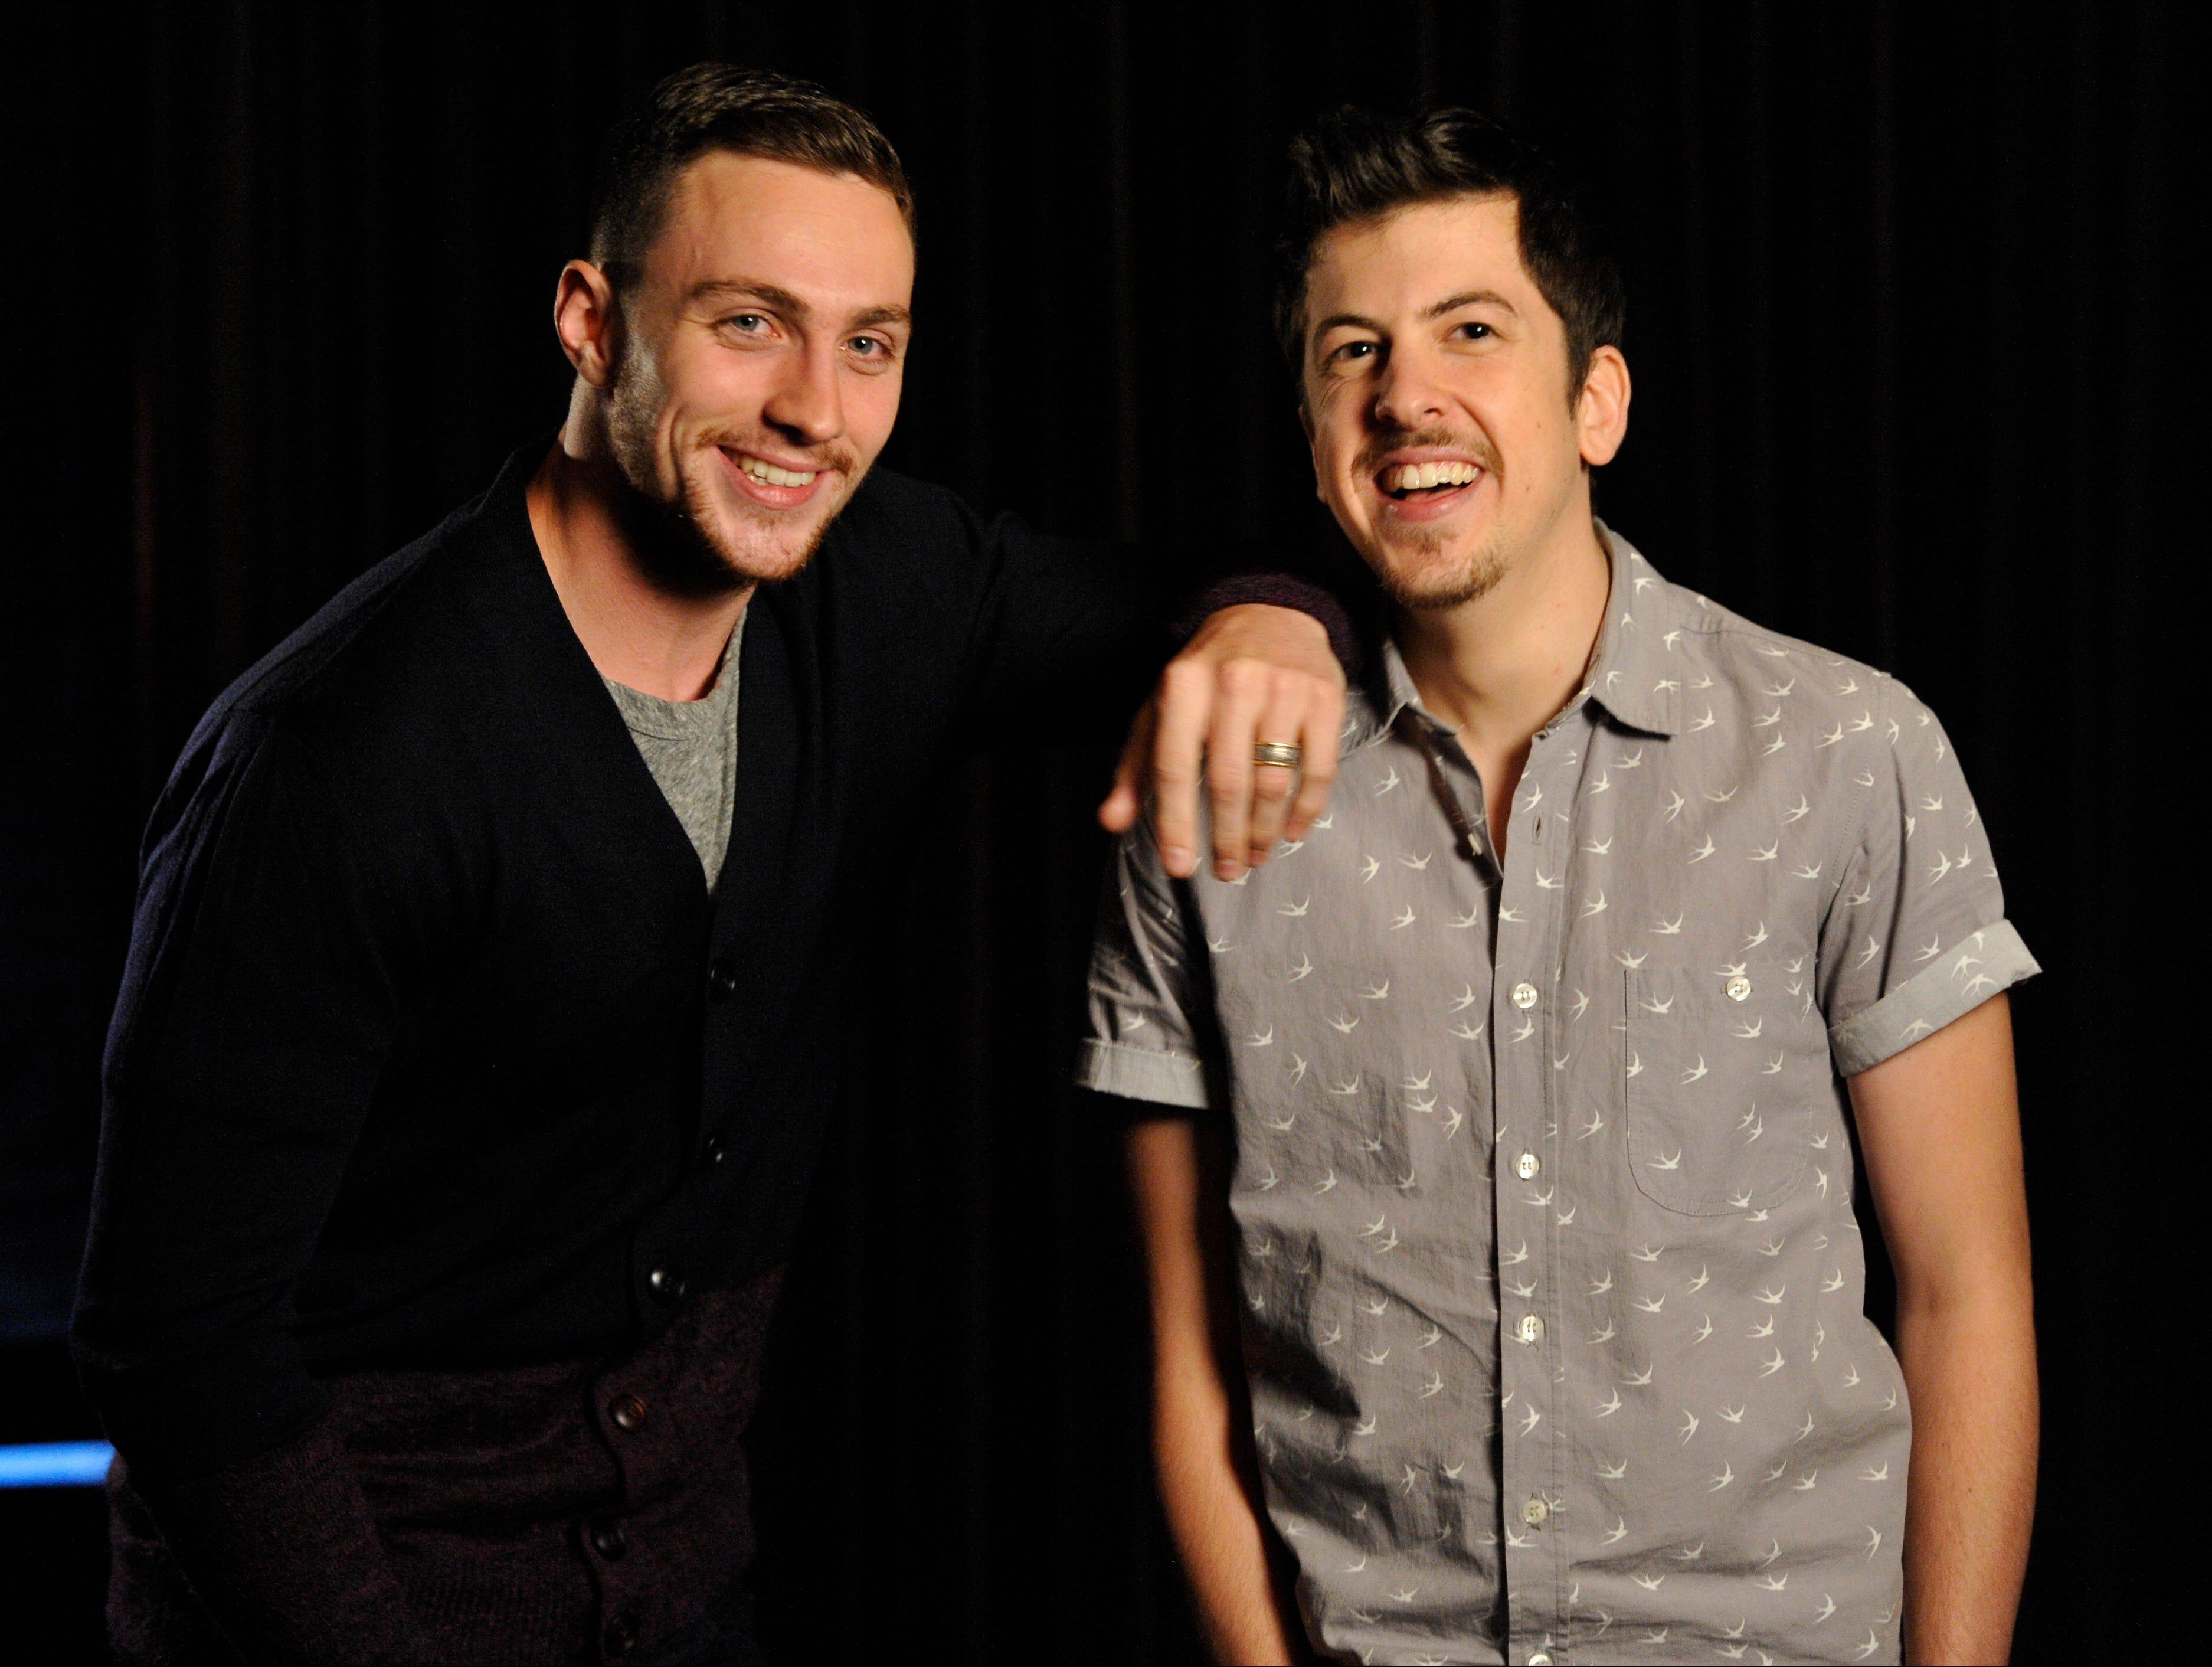 Aaron Taylor-Johnson and Christopher Mintz-Plasse